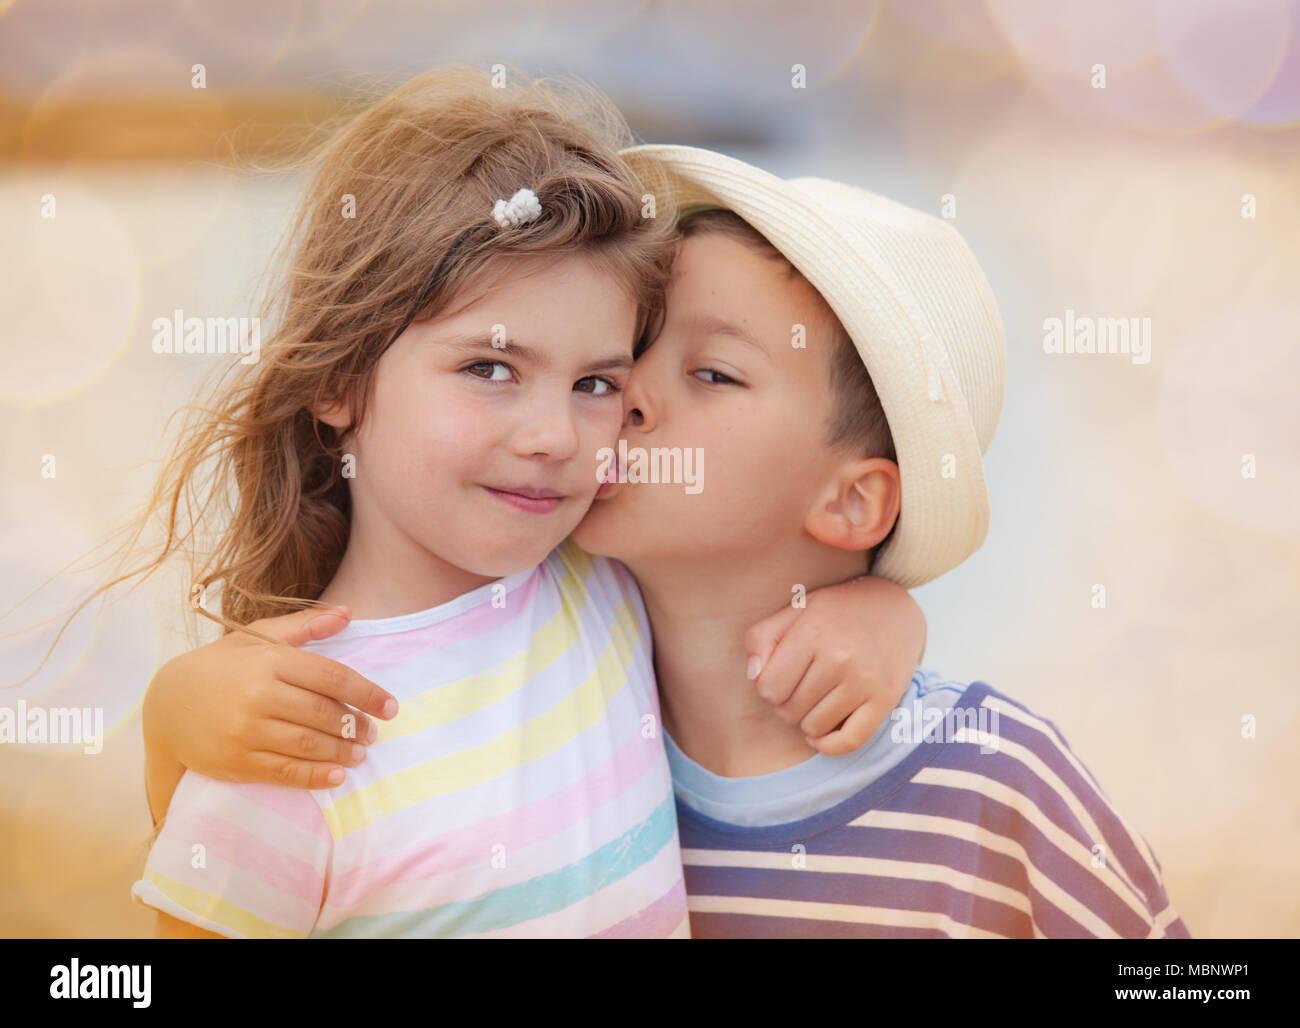 Girl Kissing Boy Stock Photos  Girl Kissing Boy Stock -1007